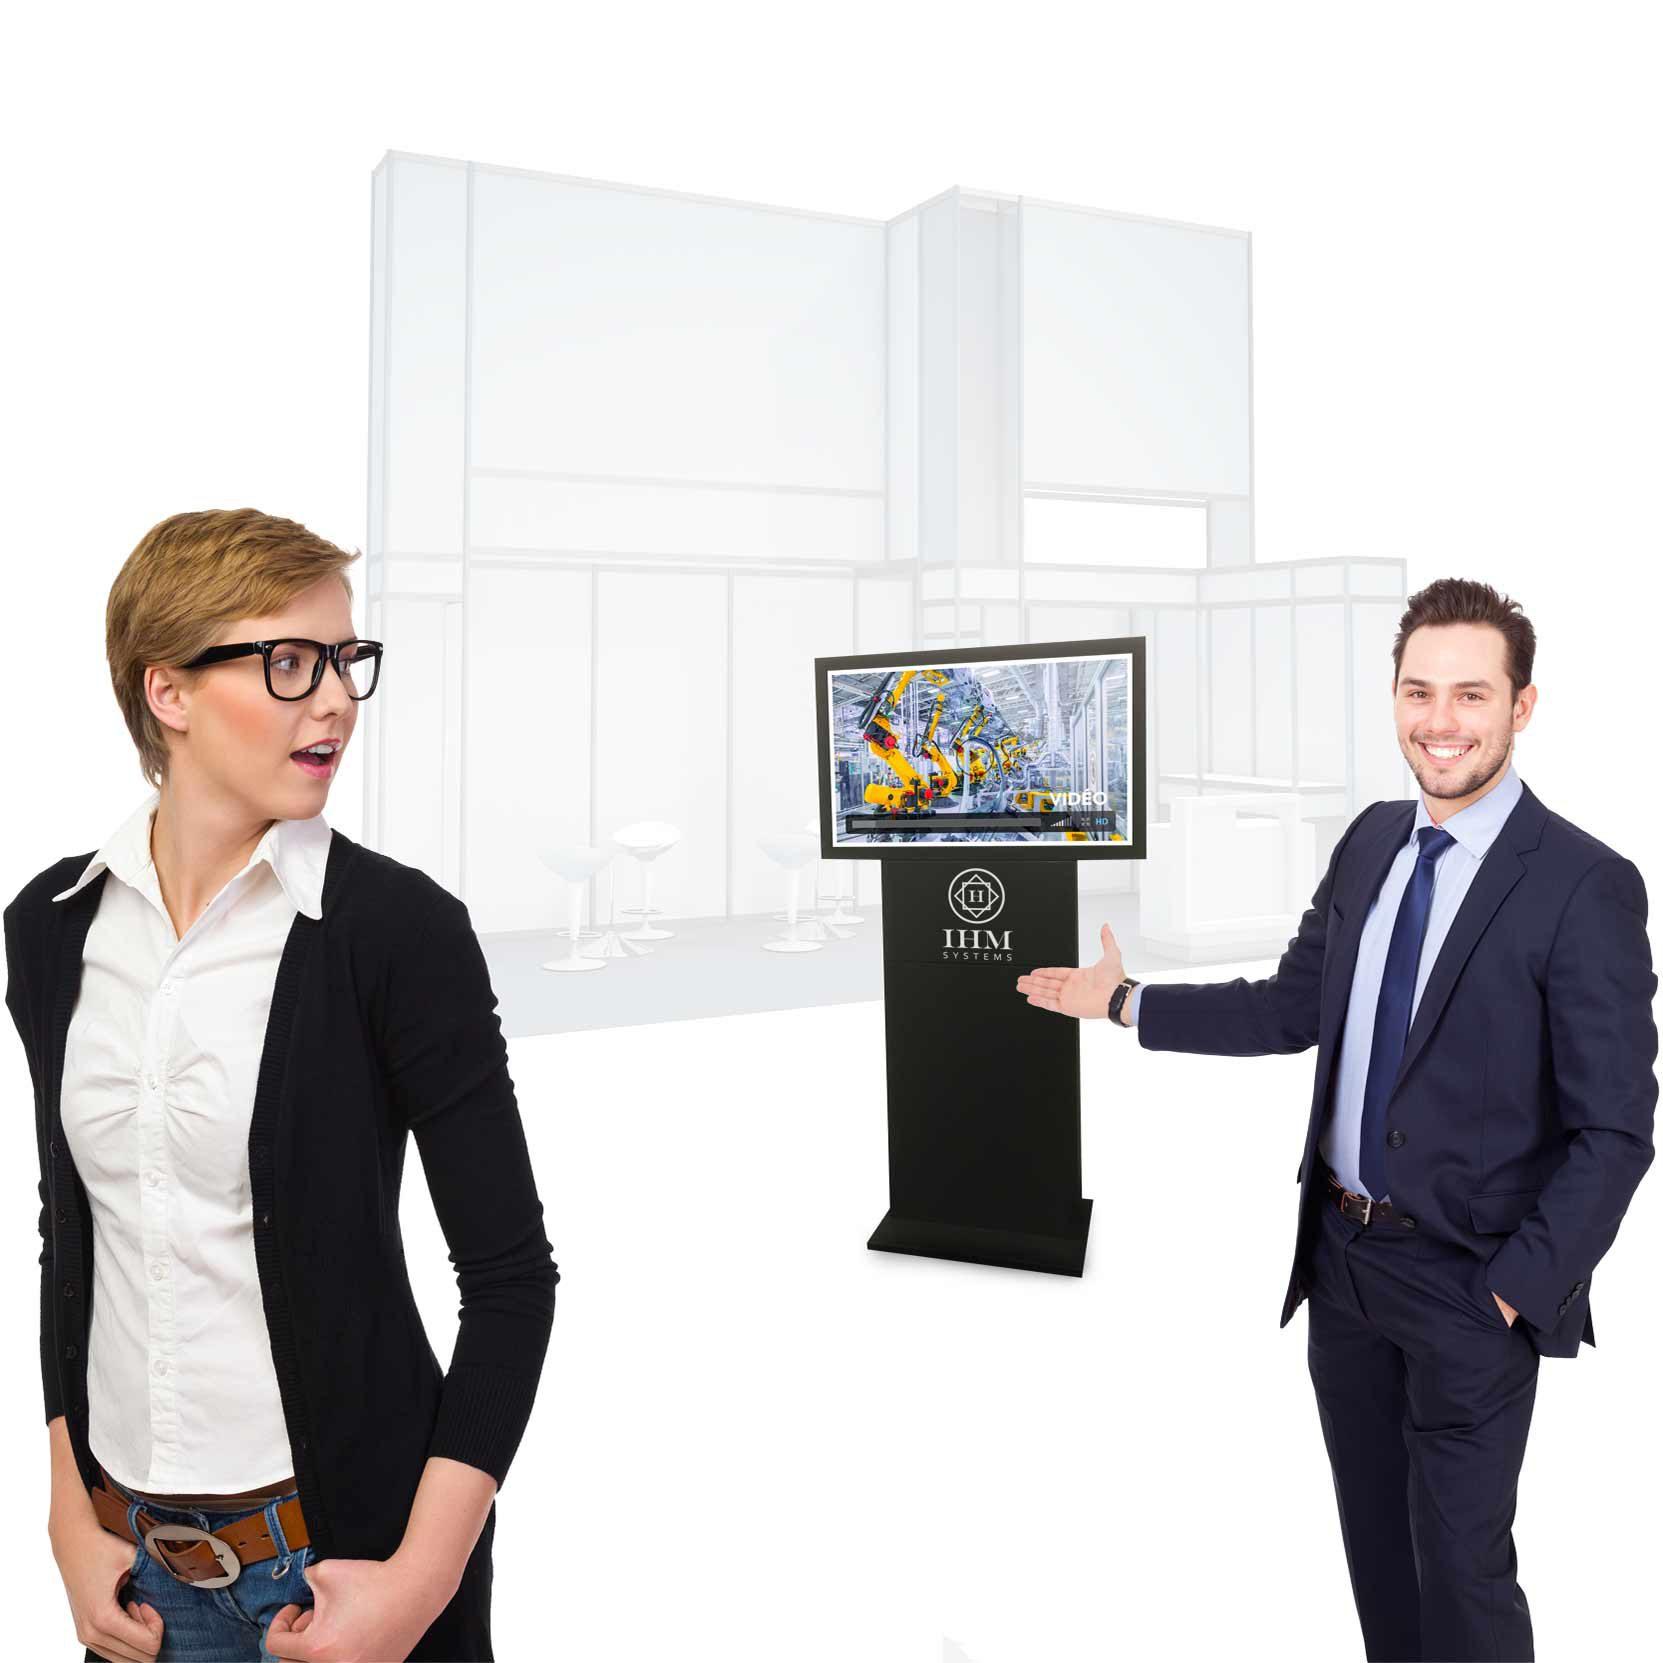 ihm-systems-totem-tactile-dynamique-stand-salon-professionnel